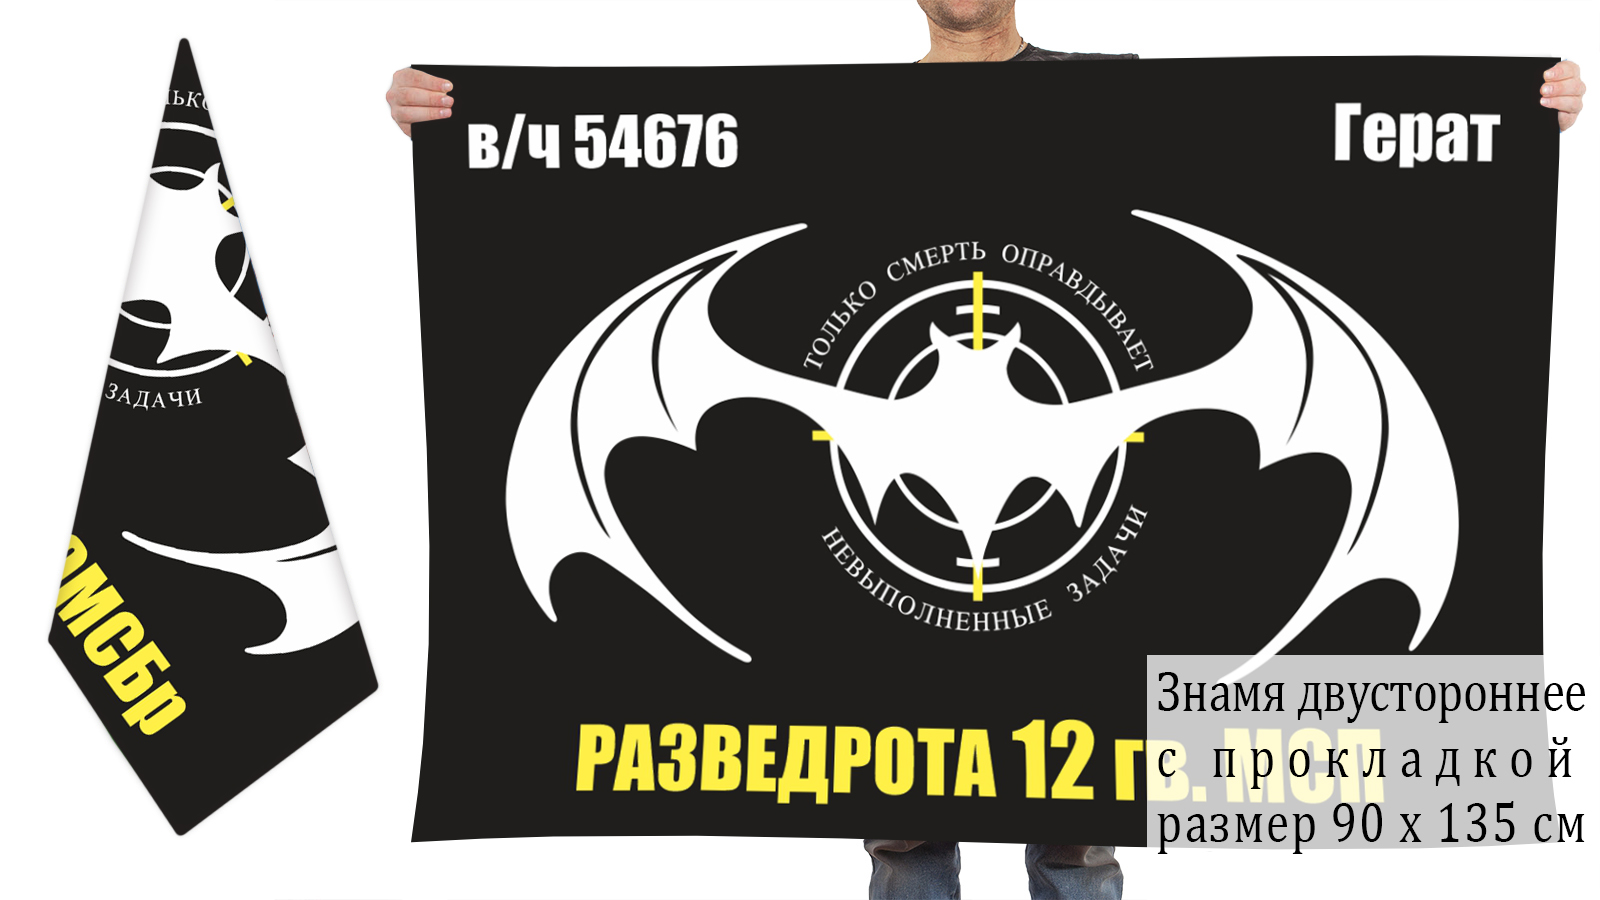 Двусторонний флаг разведроты 12 гвардейского мотострелкового полка